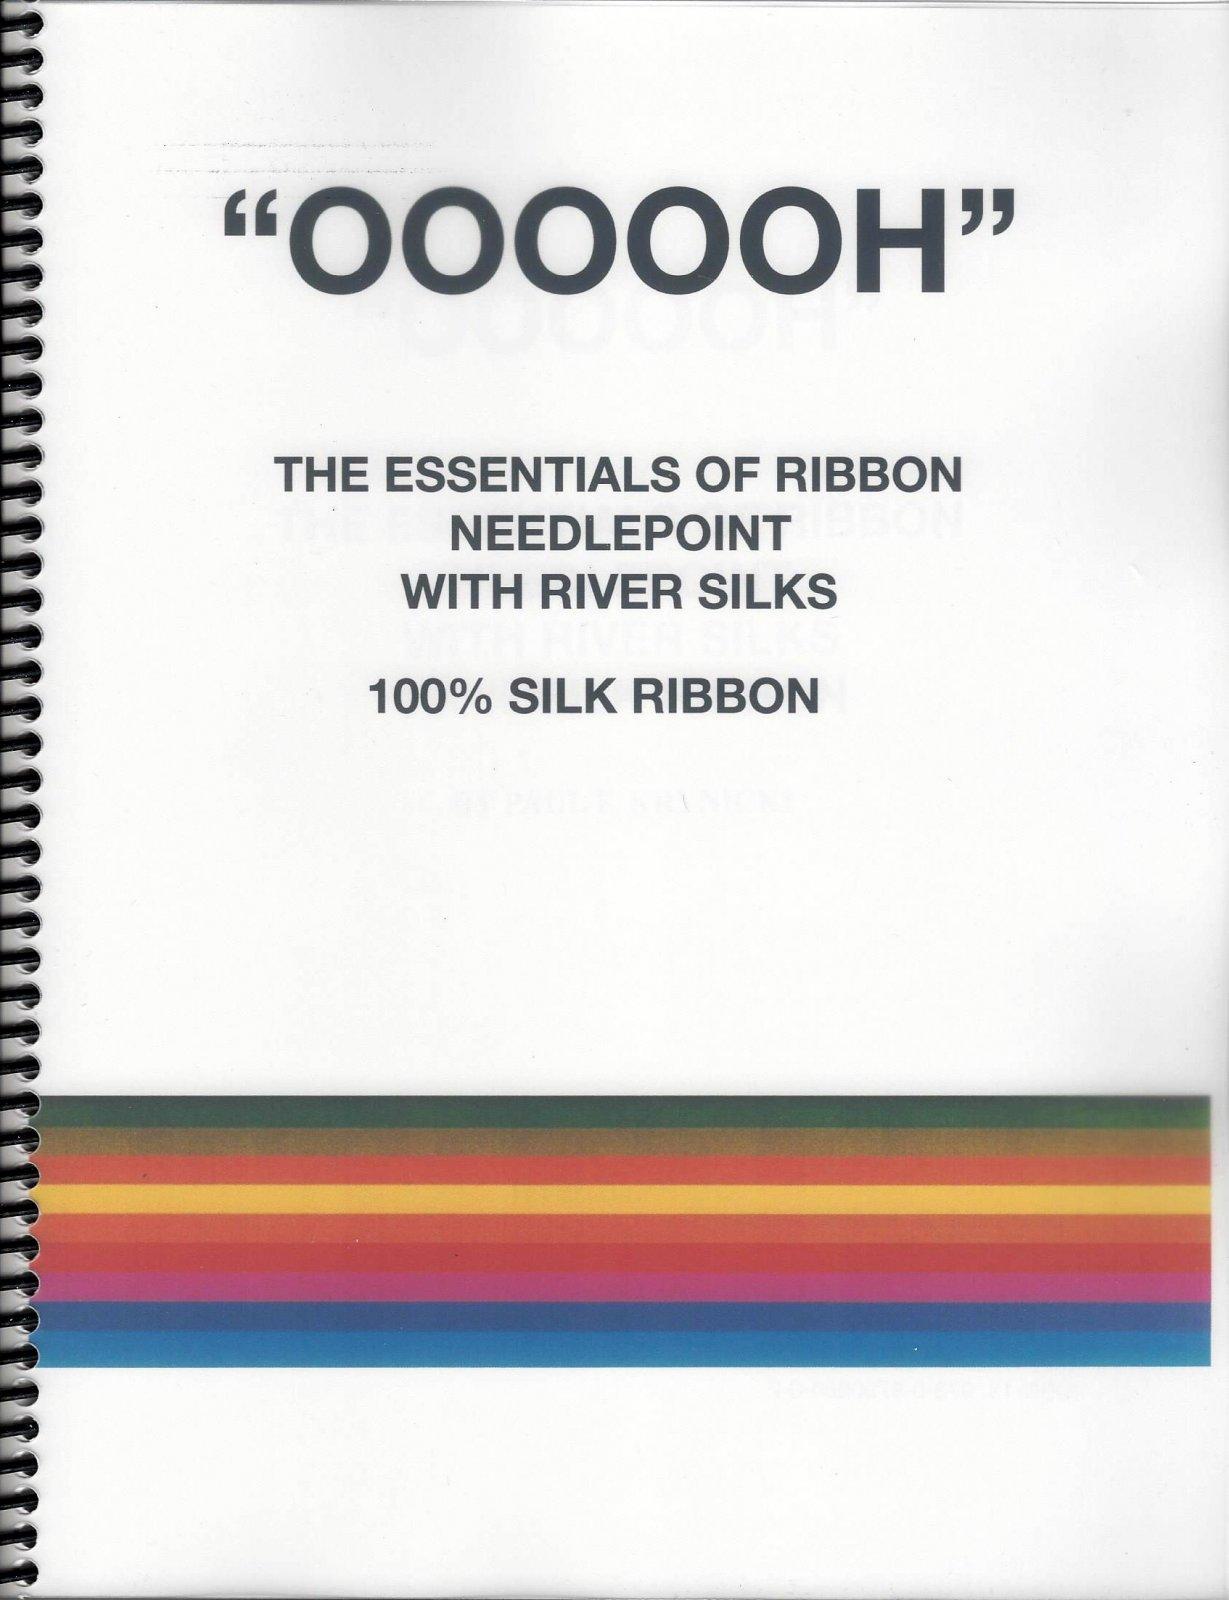 OOOOOH The Essentials of Ribbon Needlepoint